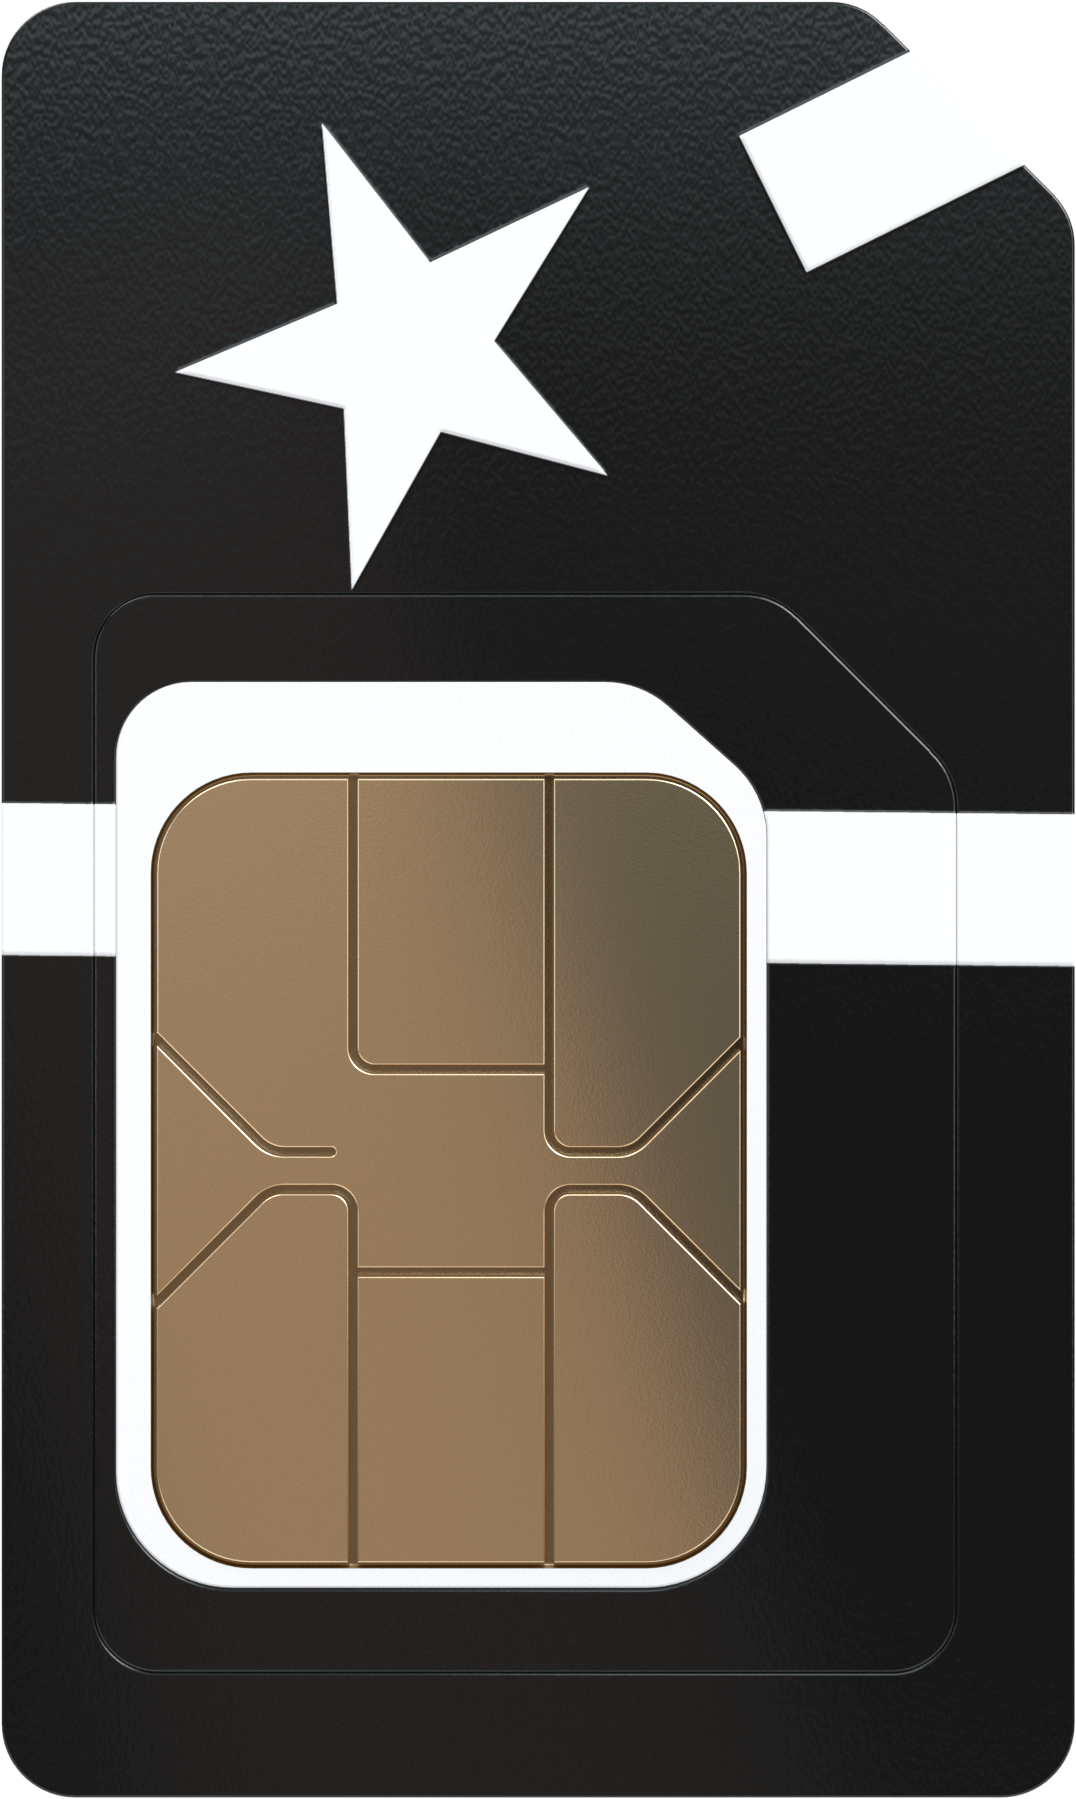 Soracom IoT Mini SIM